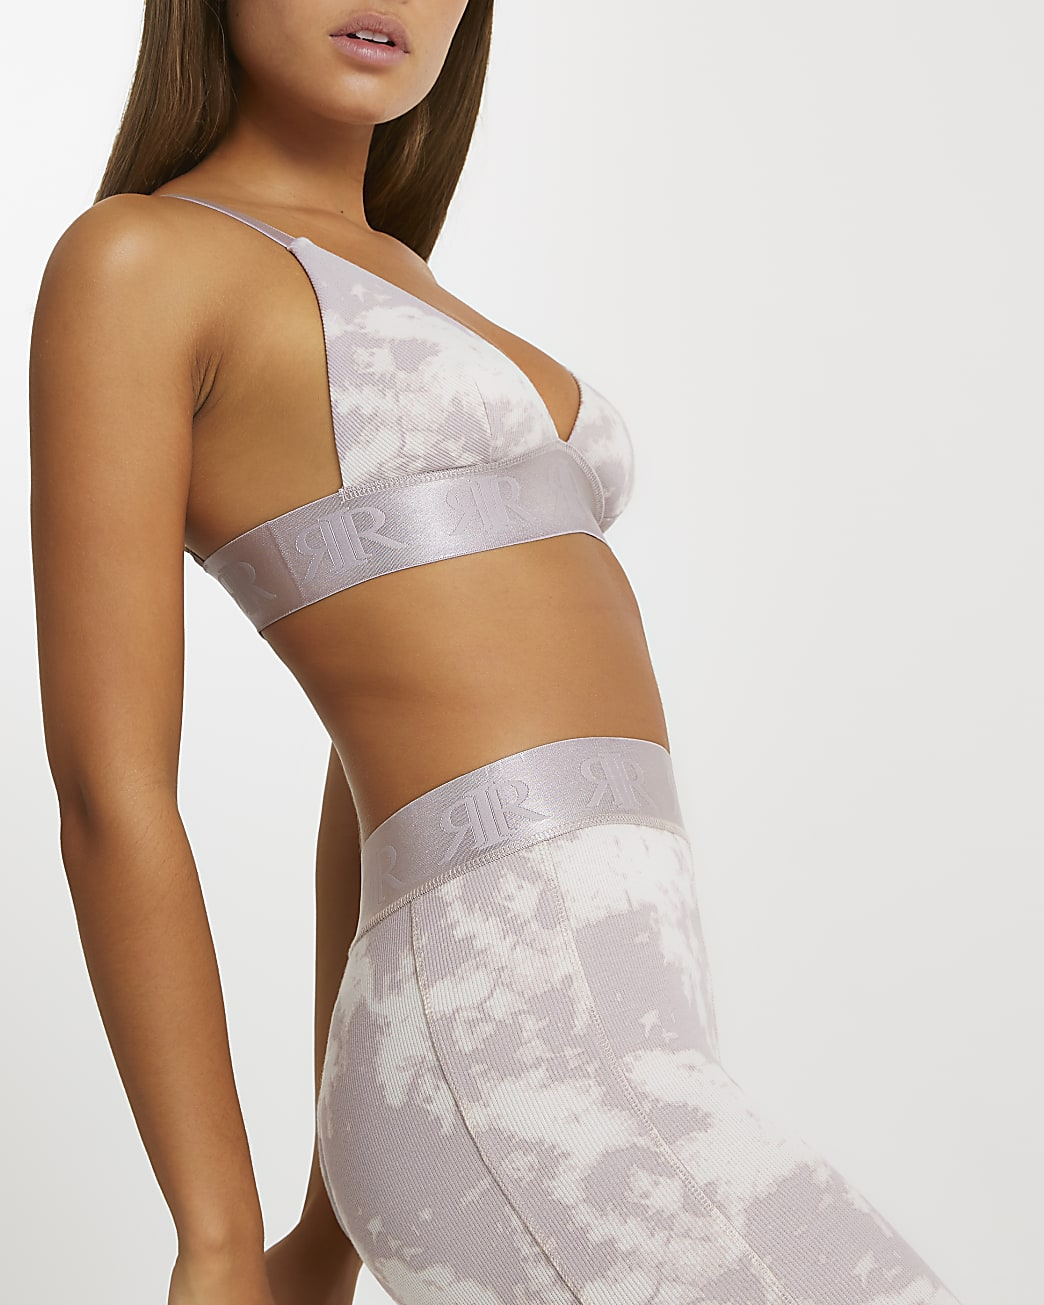 Intimates beige tie dye crop bralet top